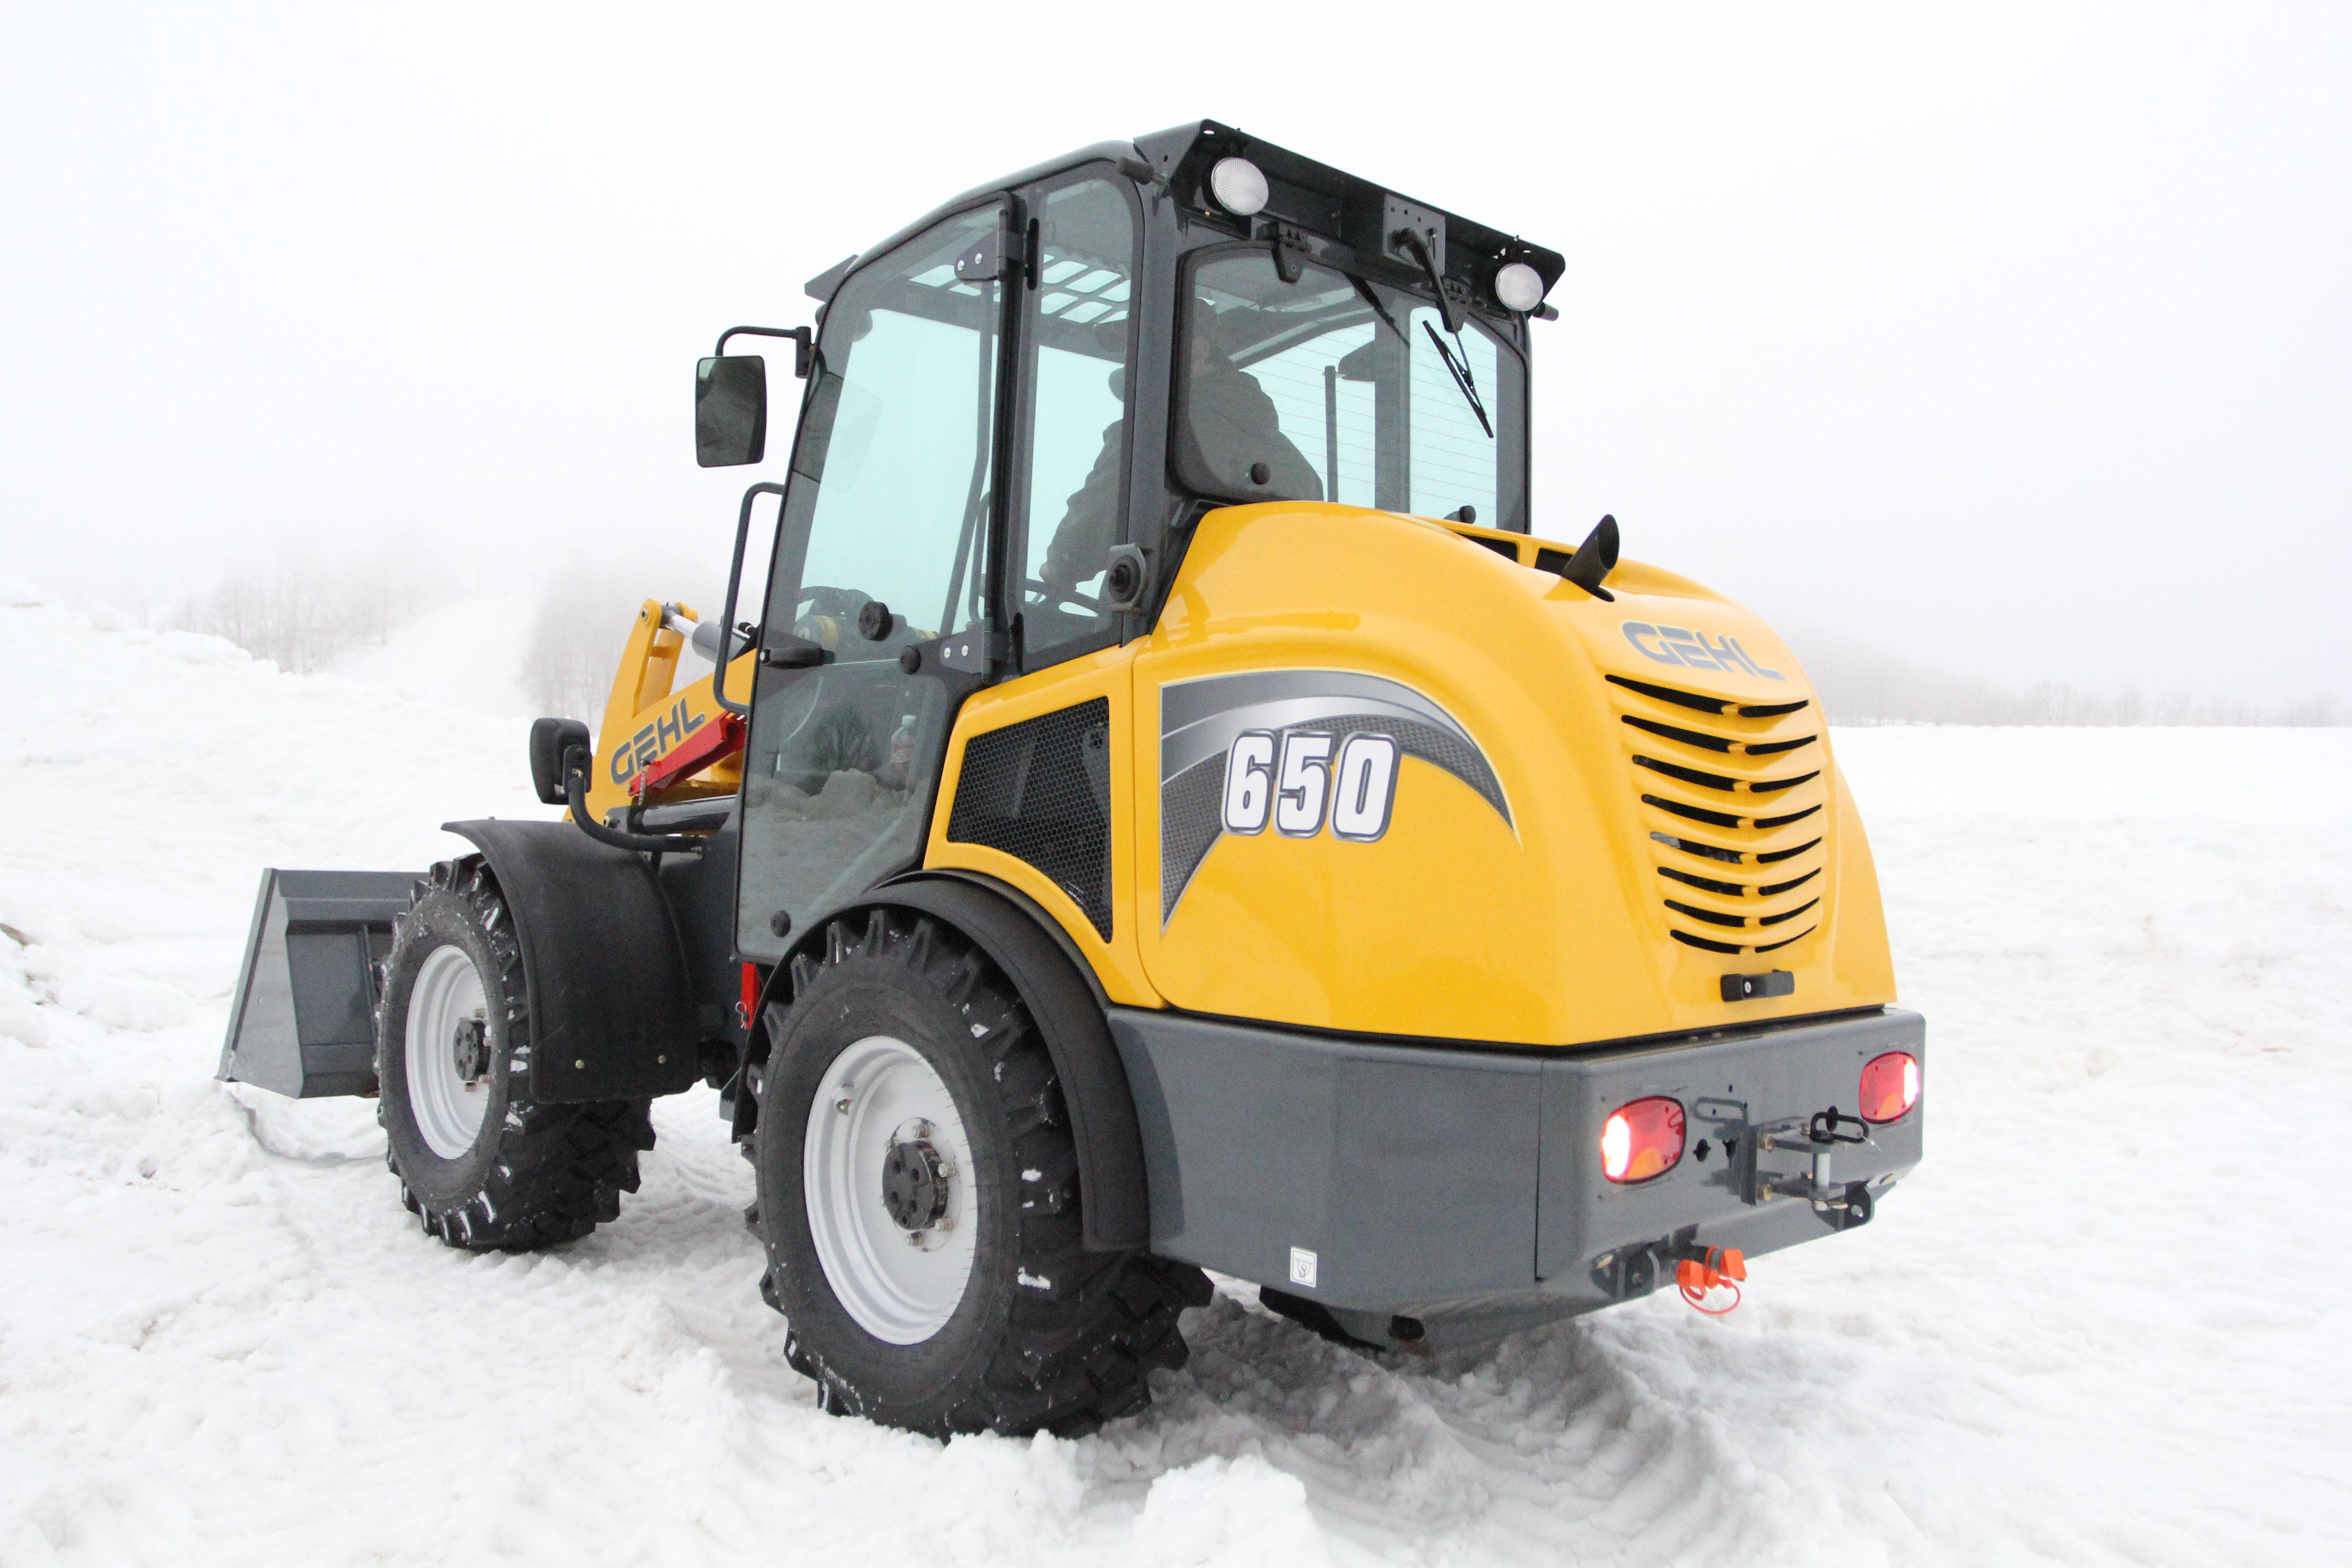 Gehl 650 snow back